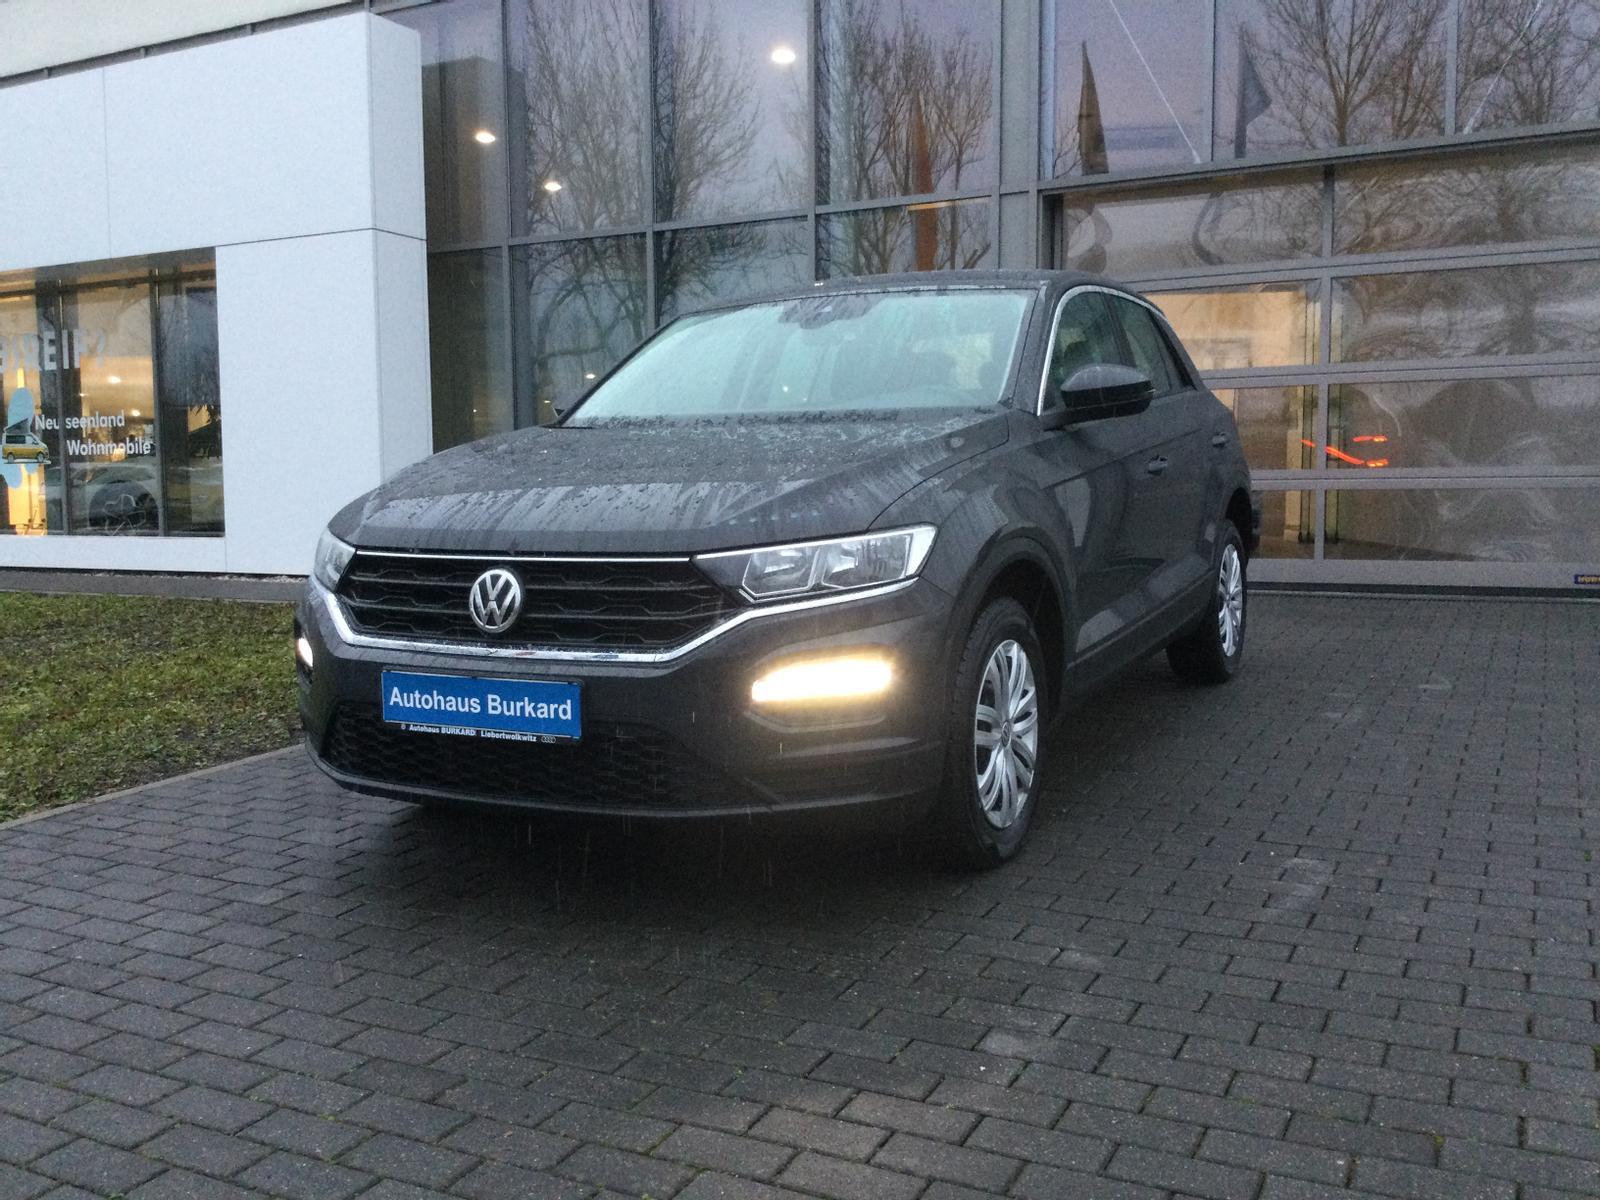 Volkswagen T-Roc 1.0 l TSI 115 PS | LED Tagfahrlicht, Jahr 2018, Benzin